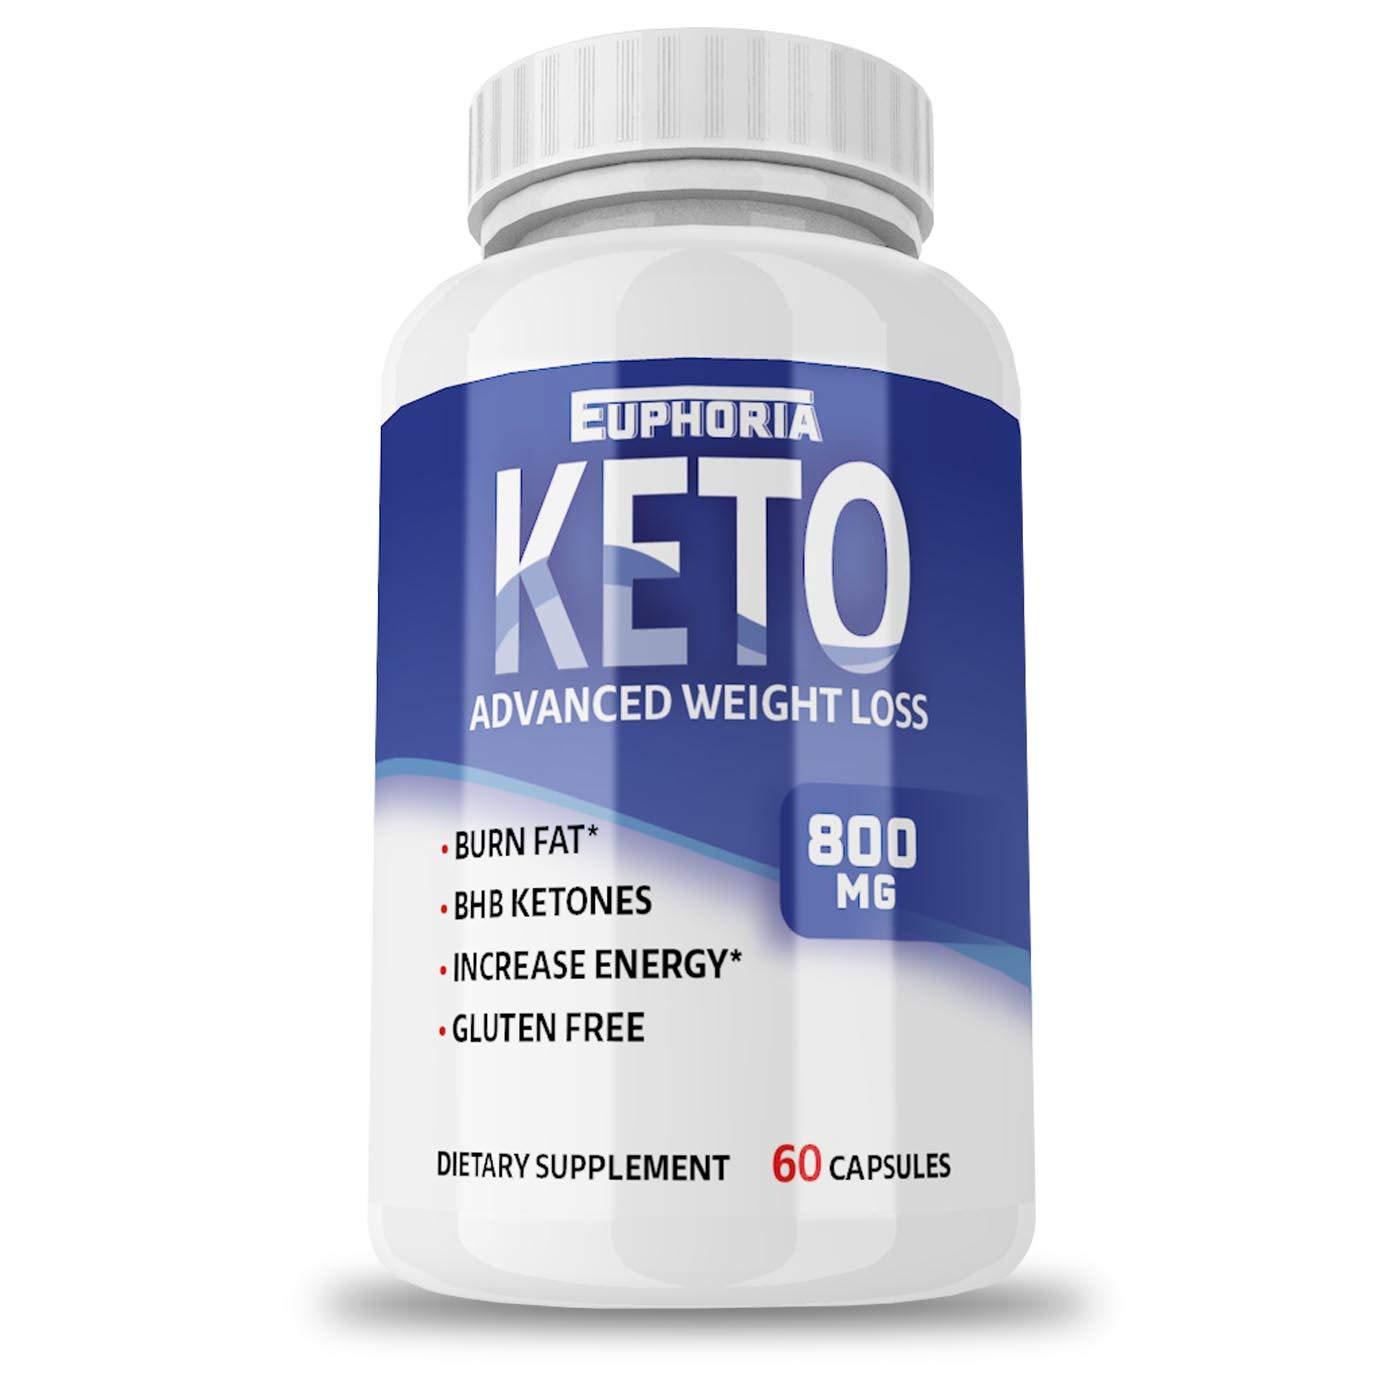 Premium Keto Pills - Keto Pills from Shark Tank - Best Ketosis Supplement for Women and Men - Keto Capsules - Keto Diet - Weight Loss Supplements - Best Keto Diet Pills - Boost Energy - Metabolism